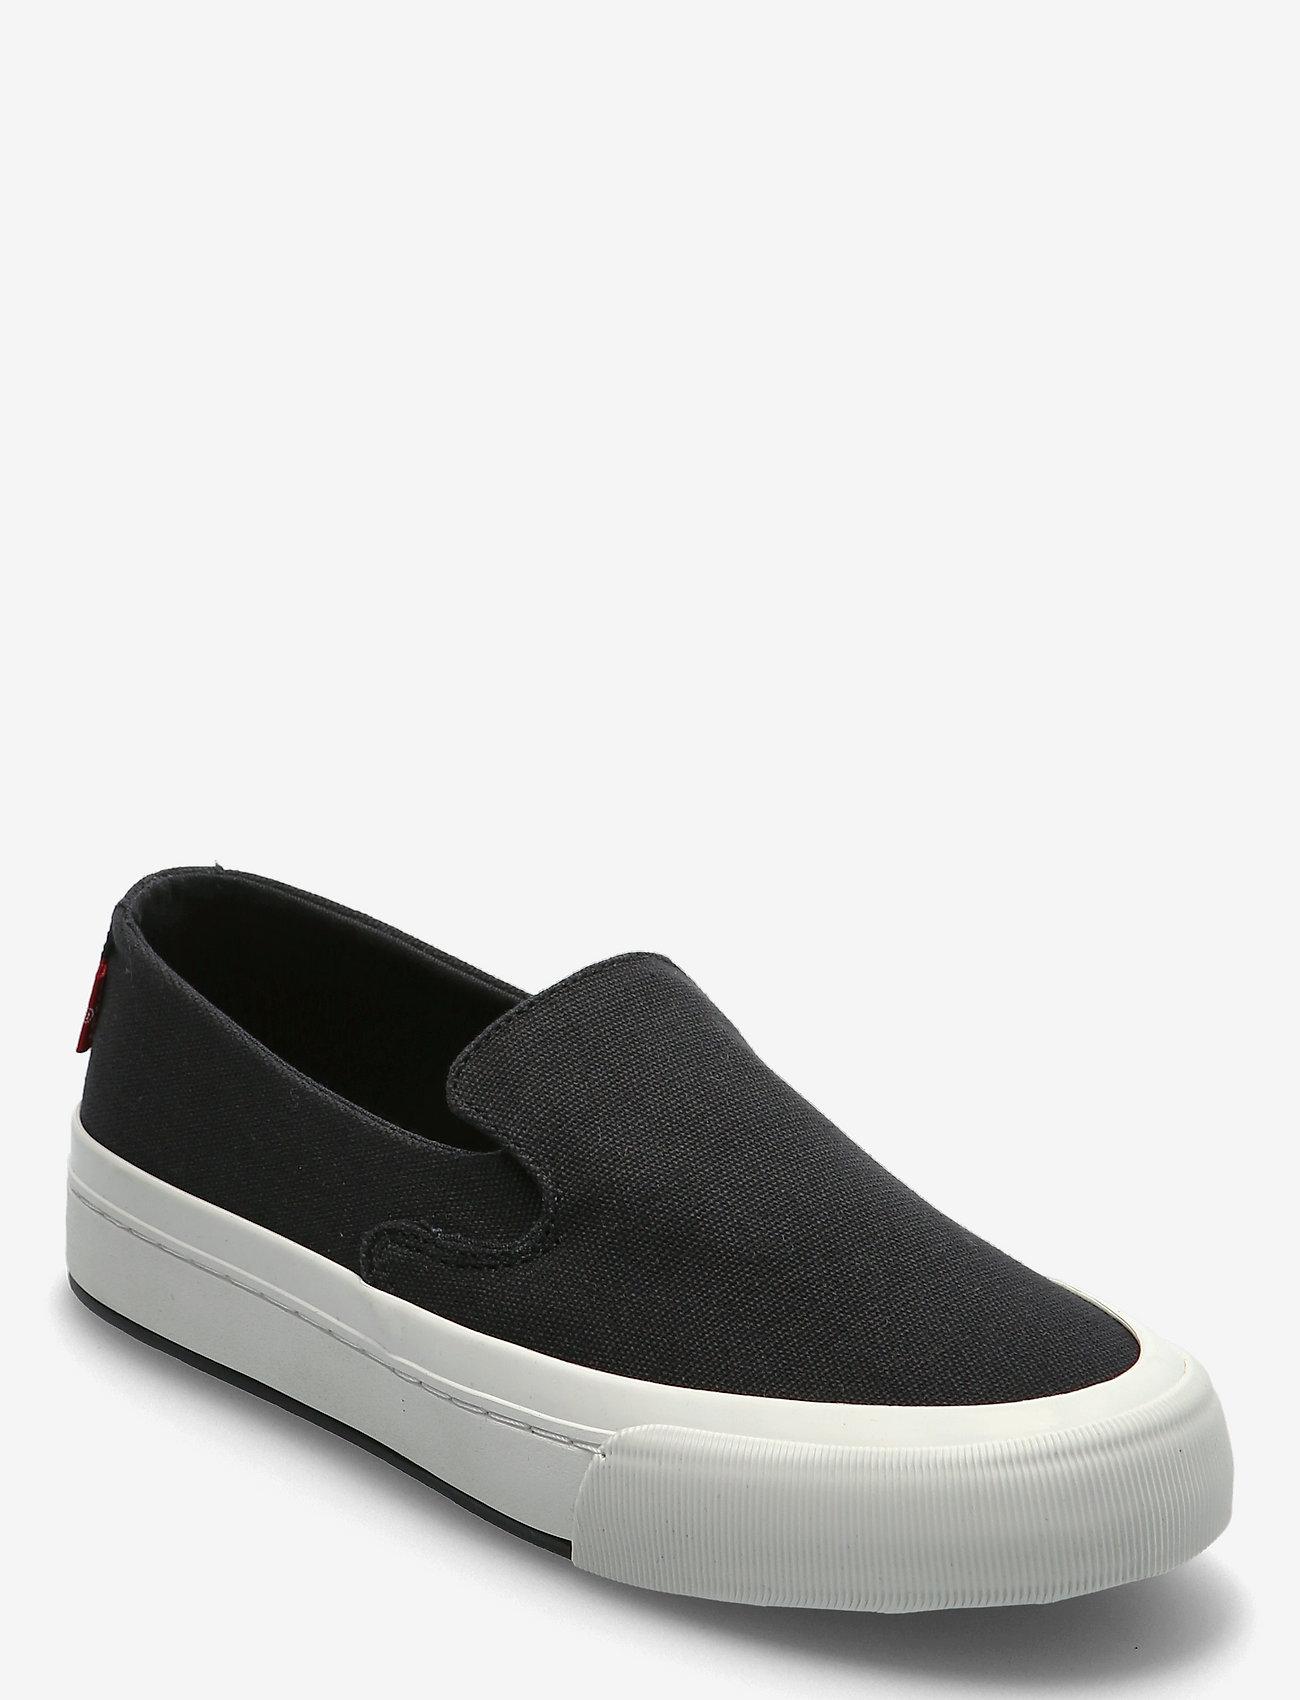 Levi's Shoes - SUMMIT SLIP ON S - slip-on sneakers - regular black - 0